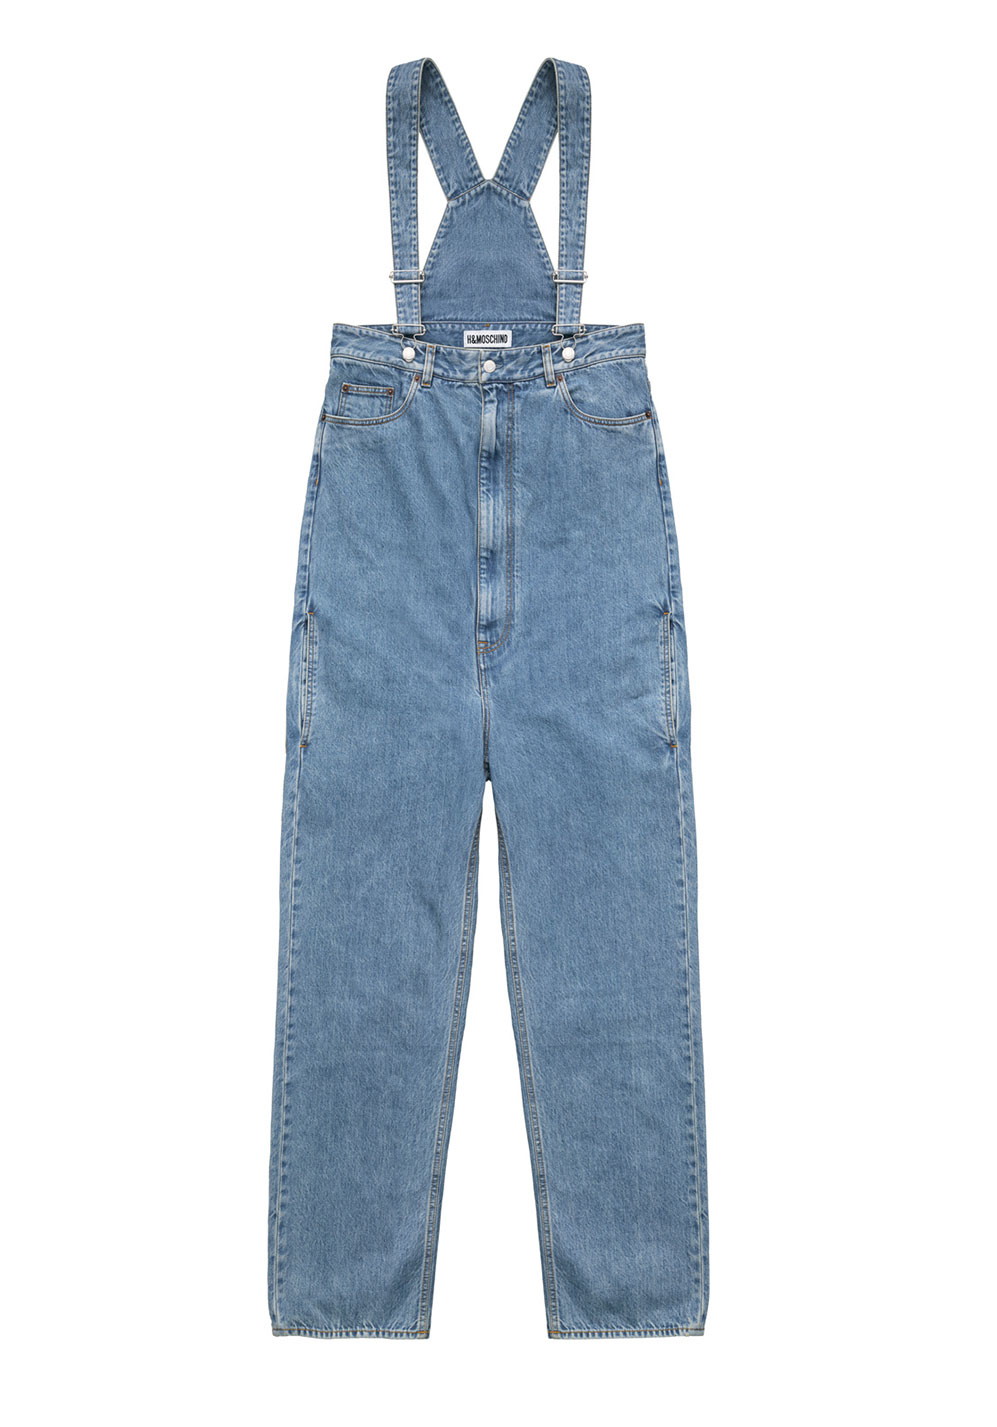 Hängselbyxor i jeanstyg Moschino x H&M